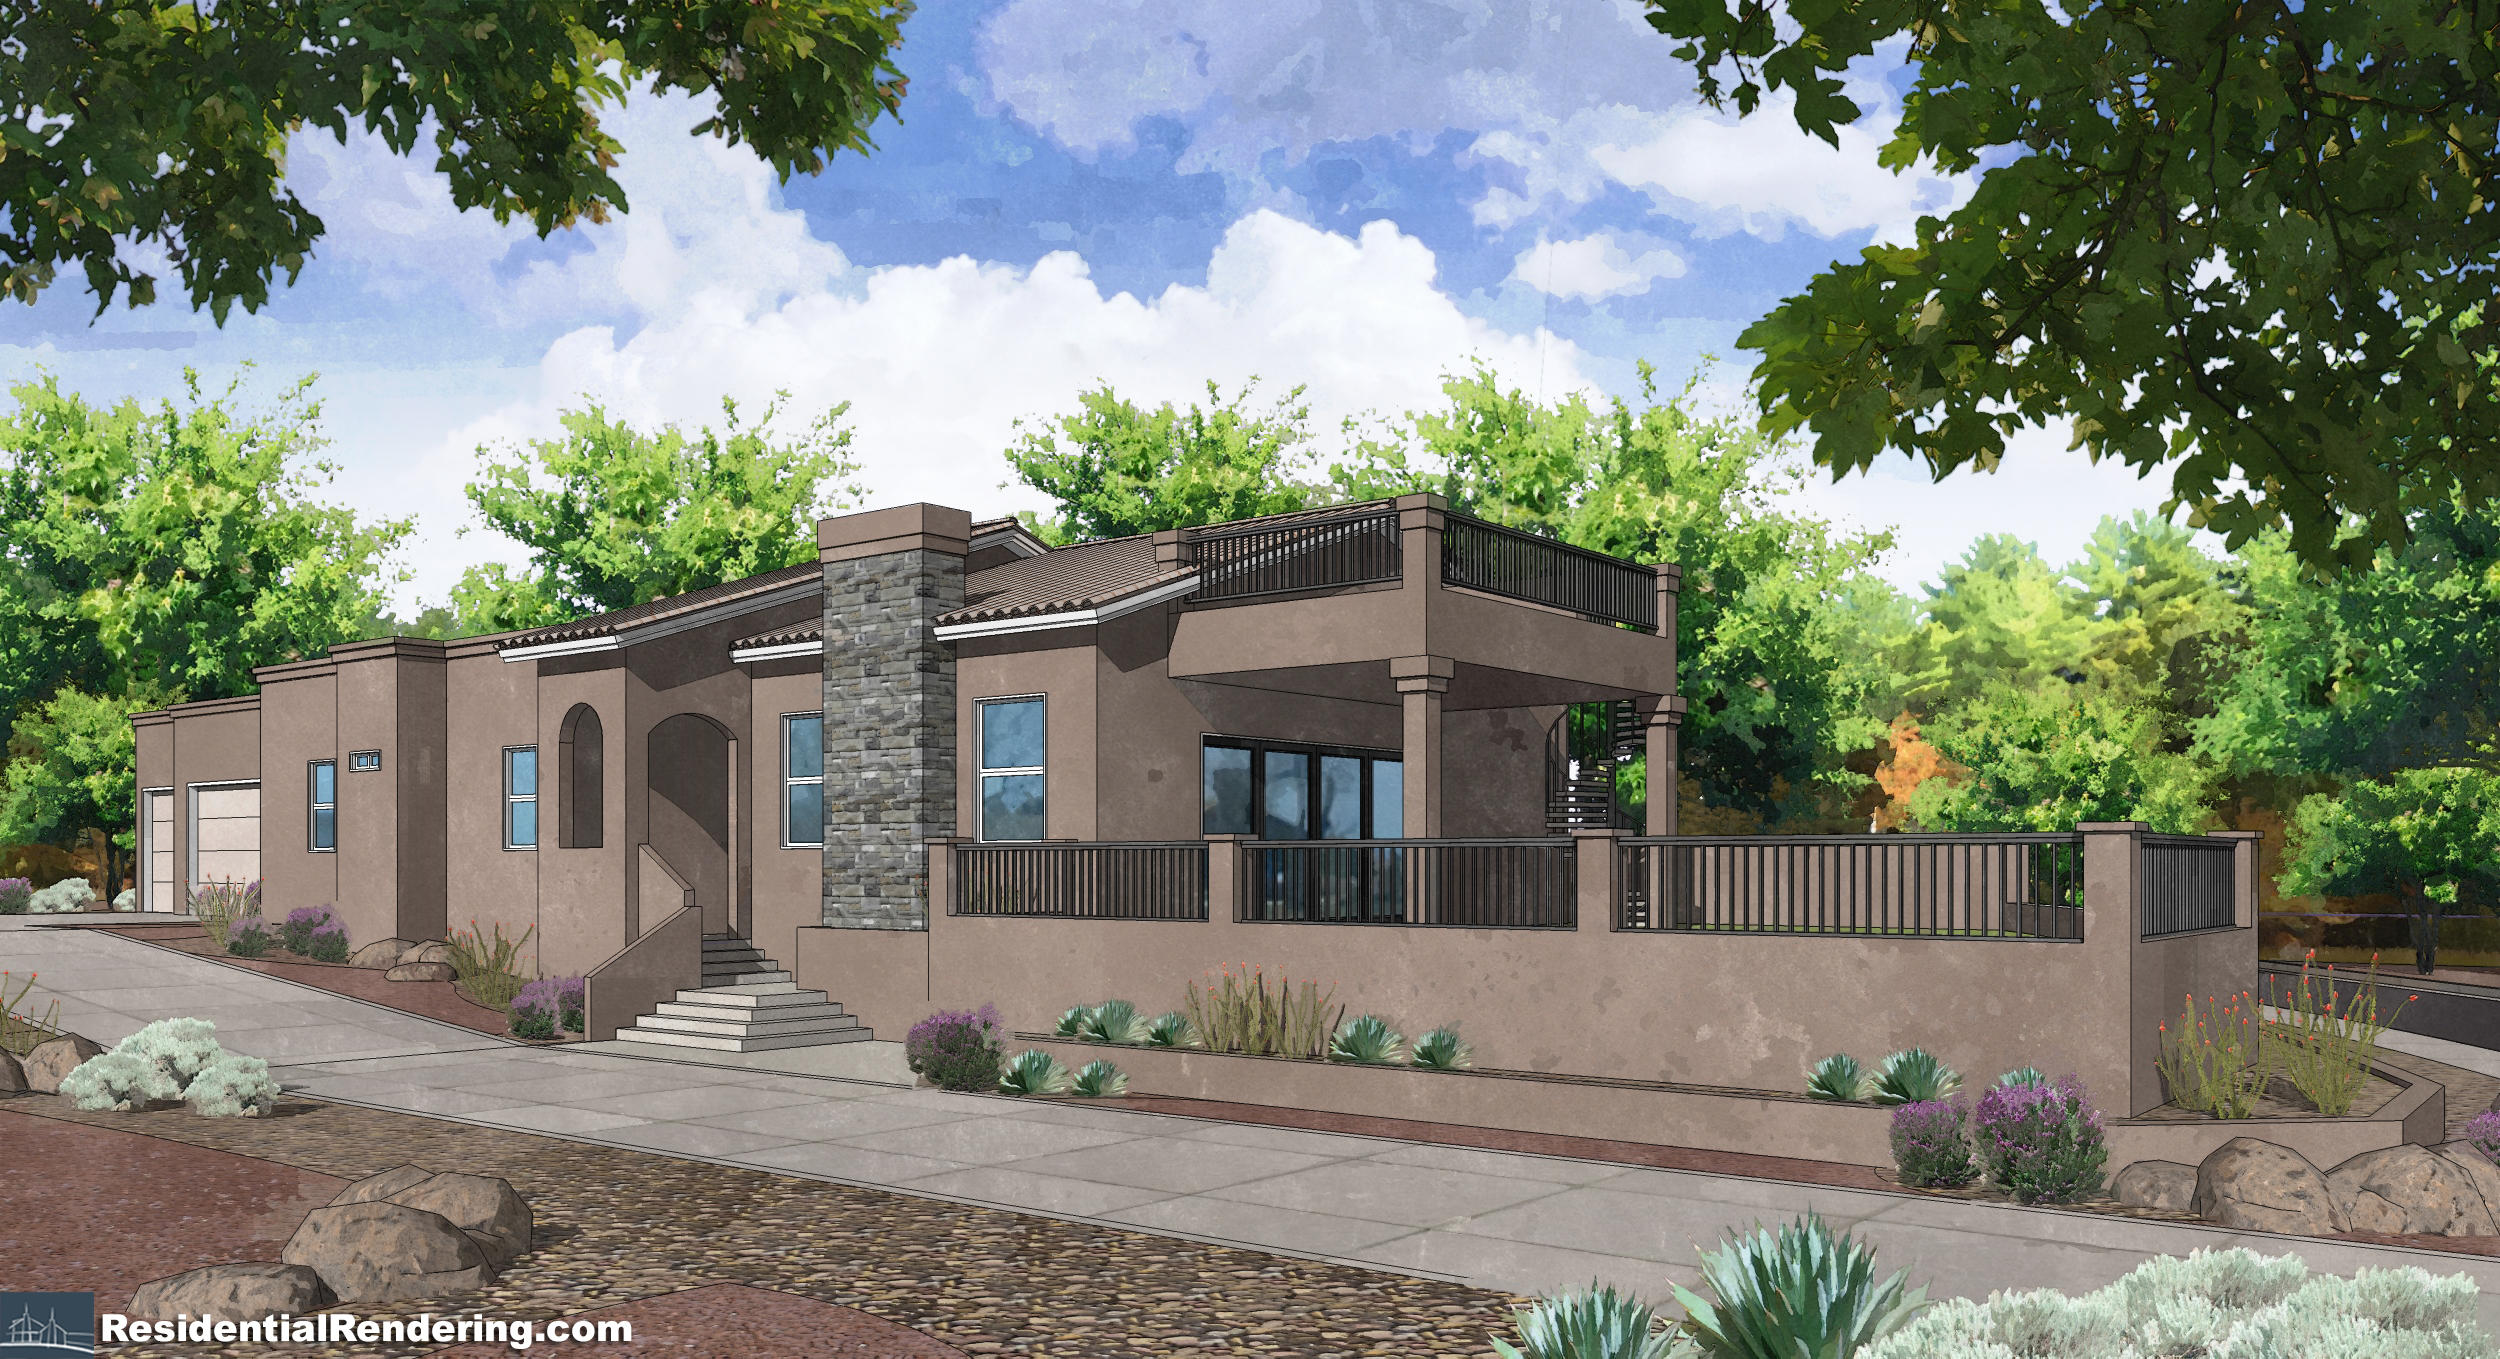 6055 REDONDO SIERRA VISTA NE, Rio Rancho, NM 87144 - Rio Rancho, NM real estate listing